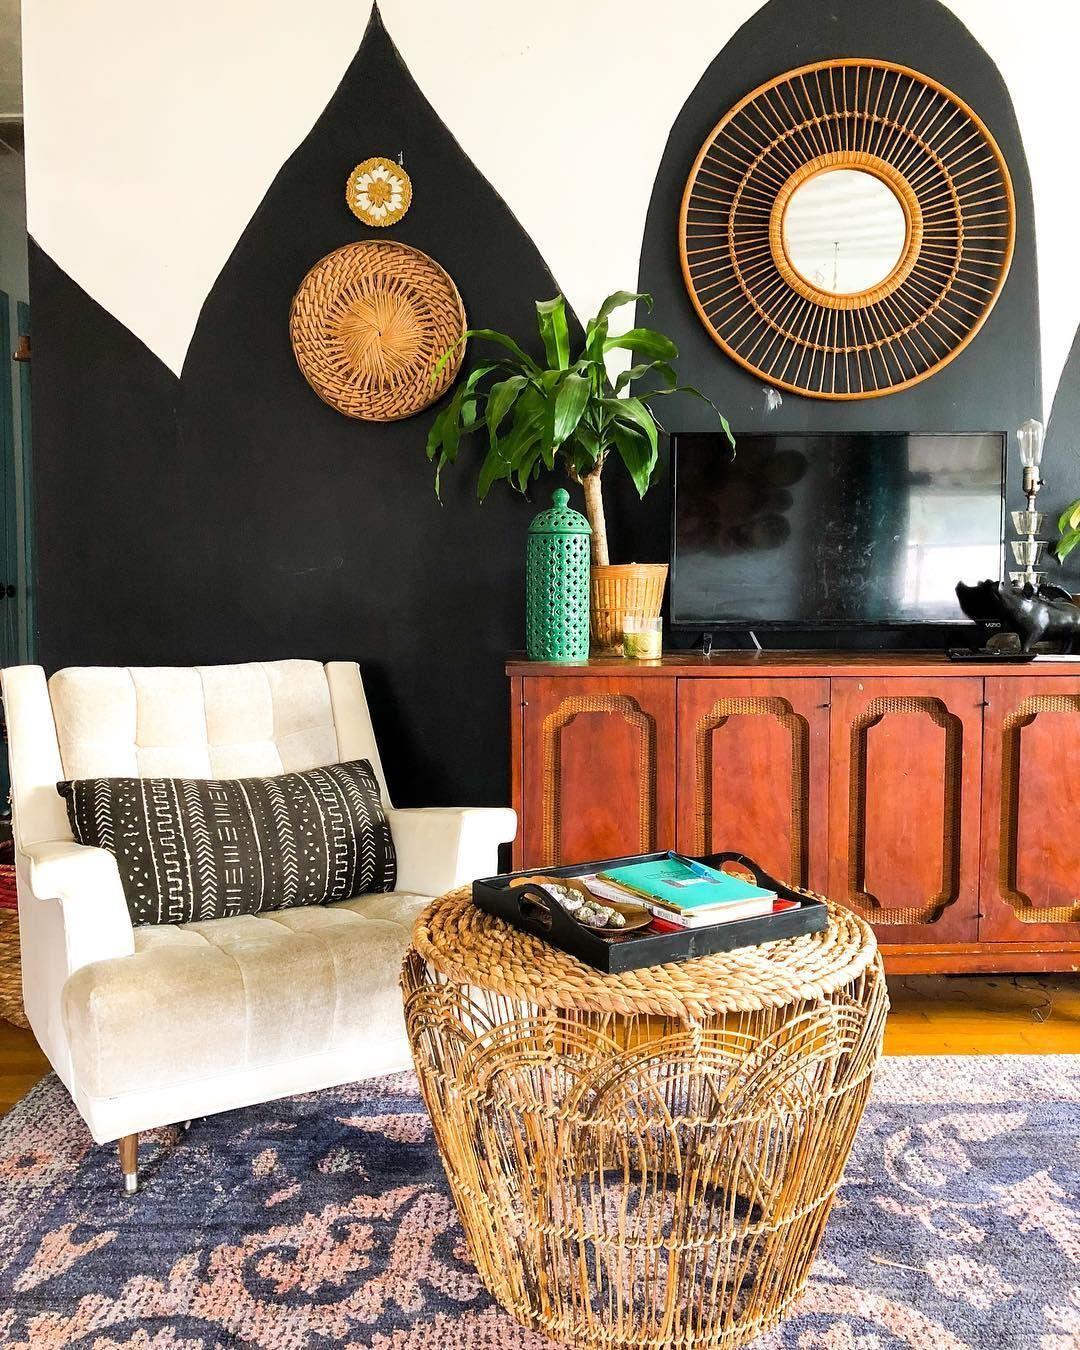 Pin by staircase wall decor on garden wall decor ideas in